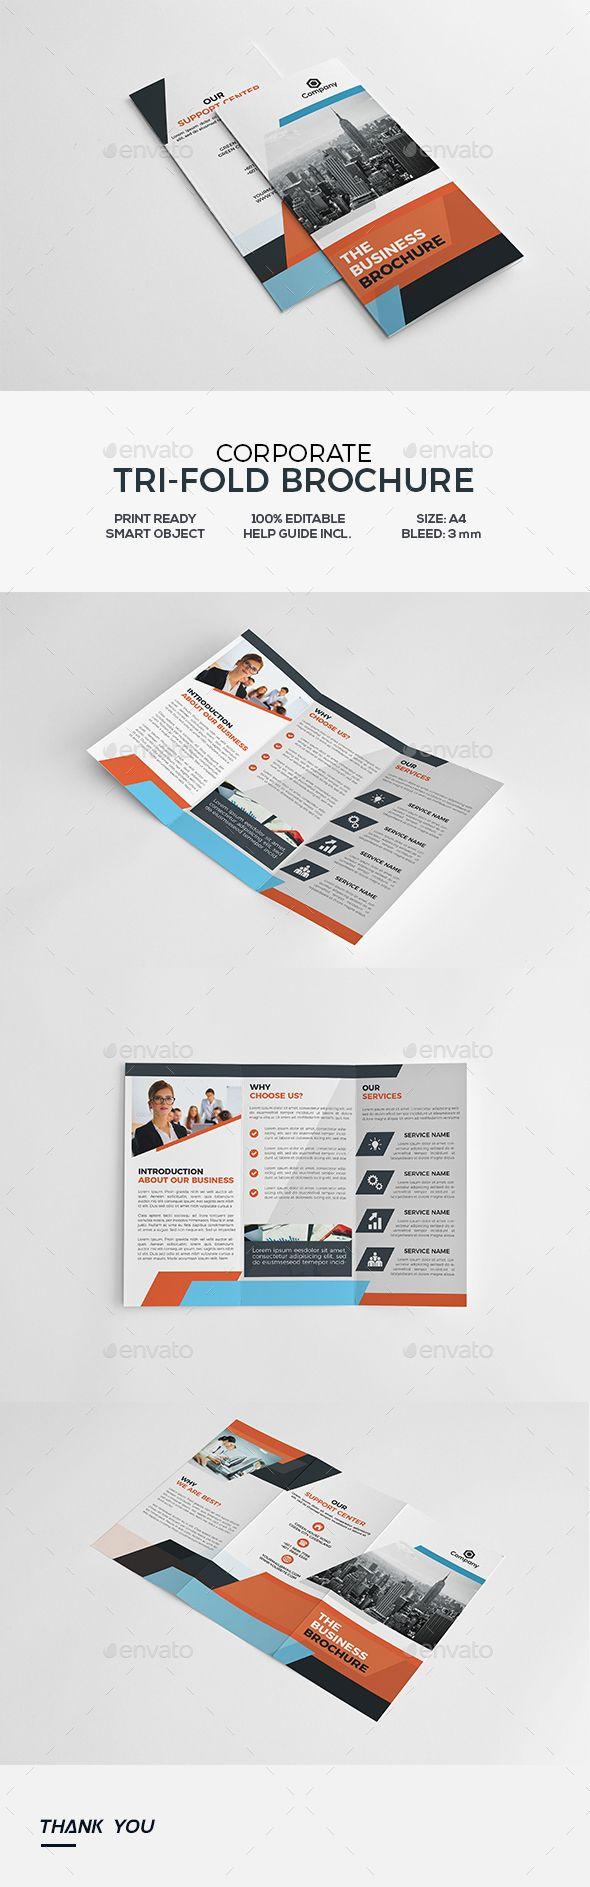 Corporate Trifold Brochure Template PSD